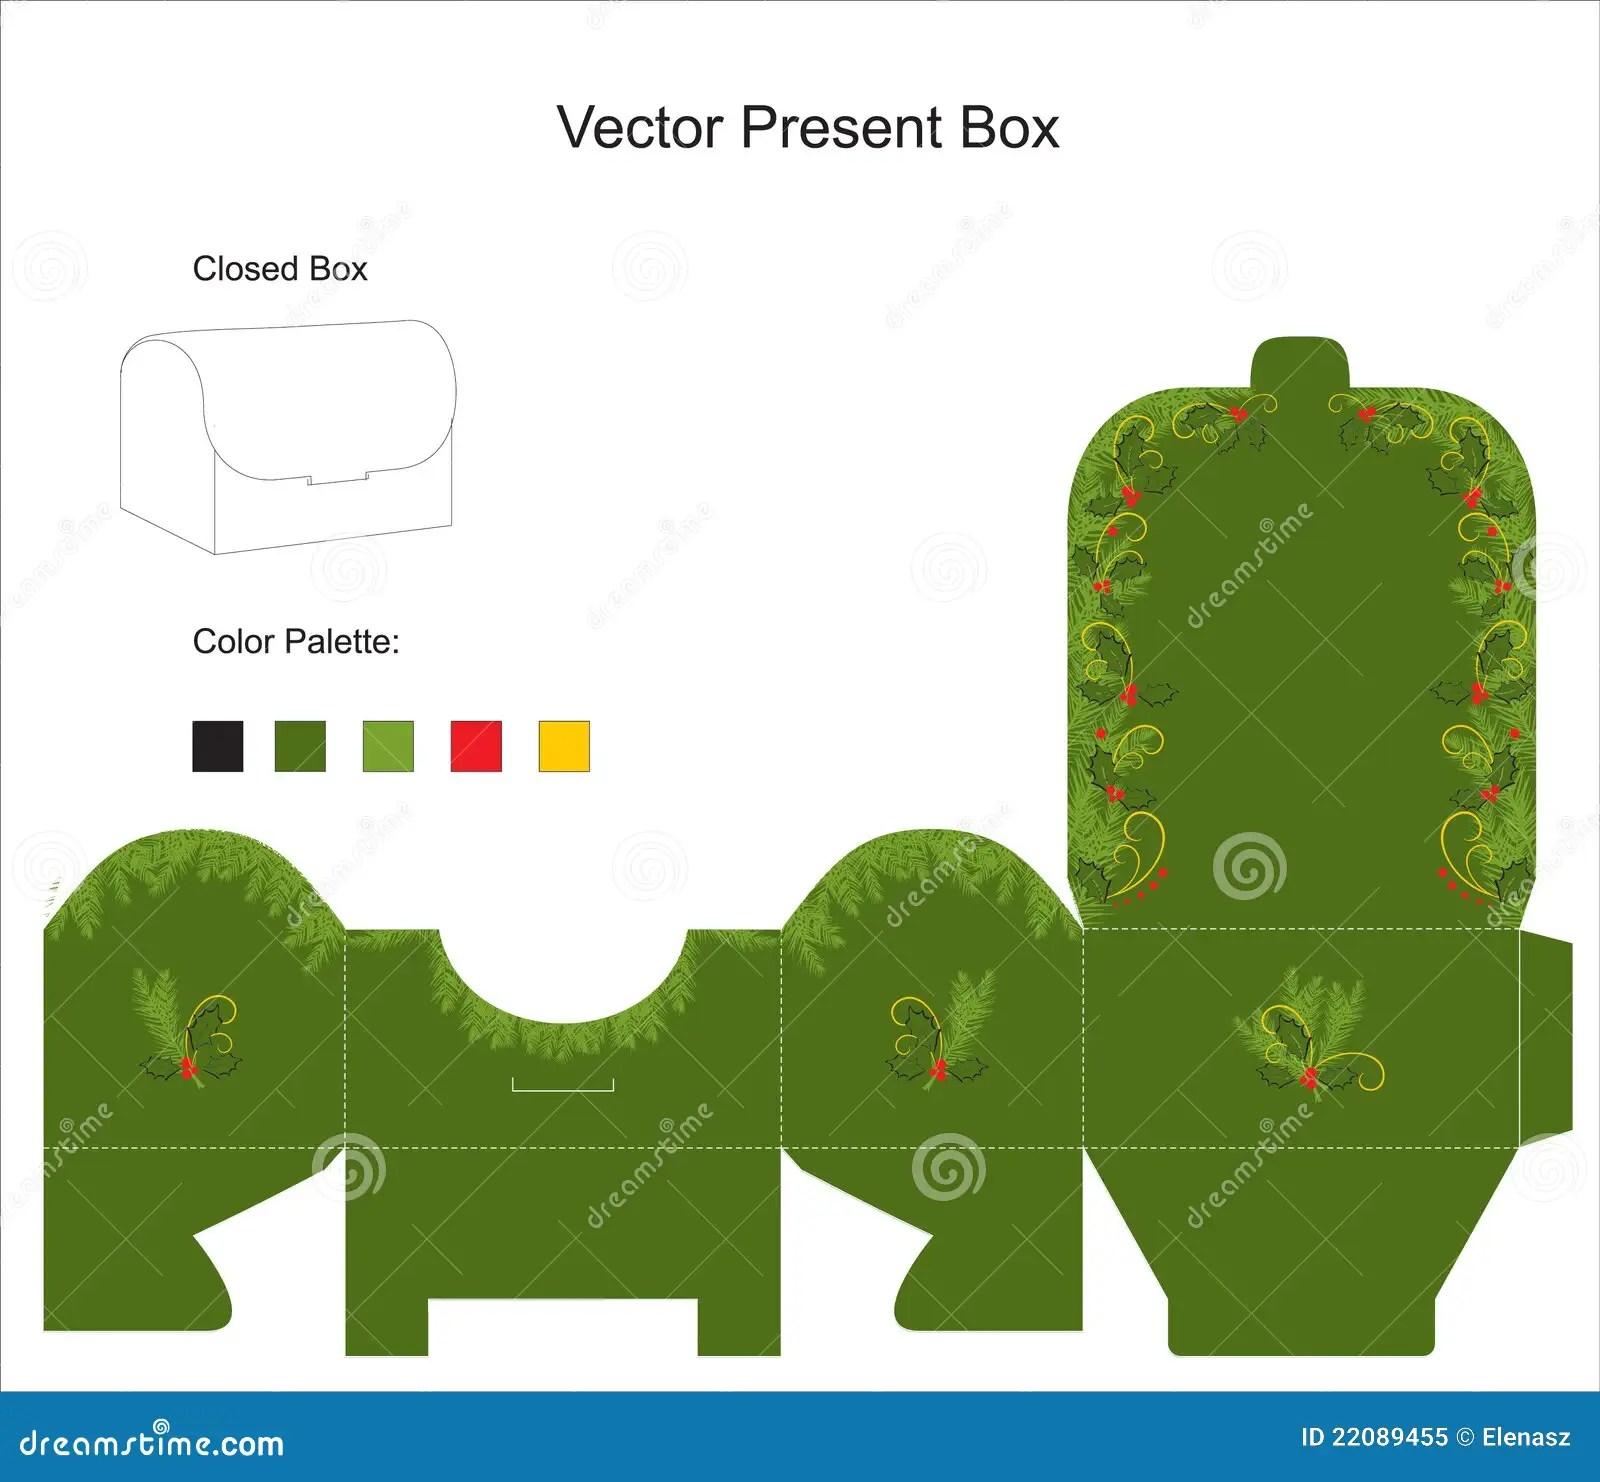 wallpapers Box Design Templates Free Download dreamstime com